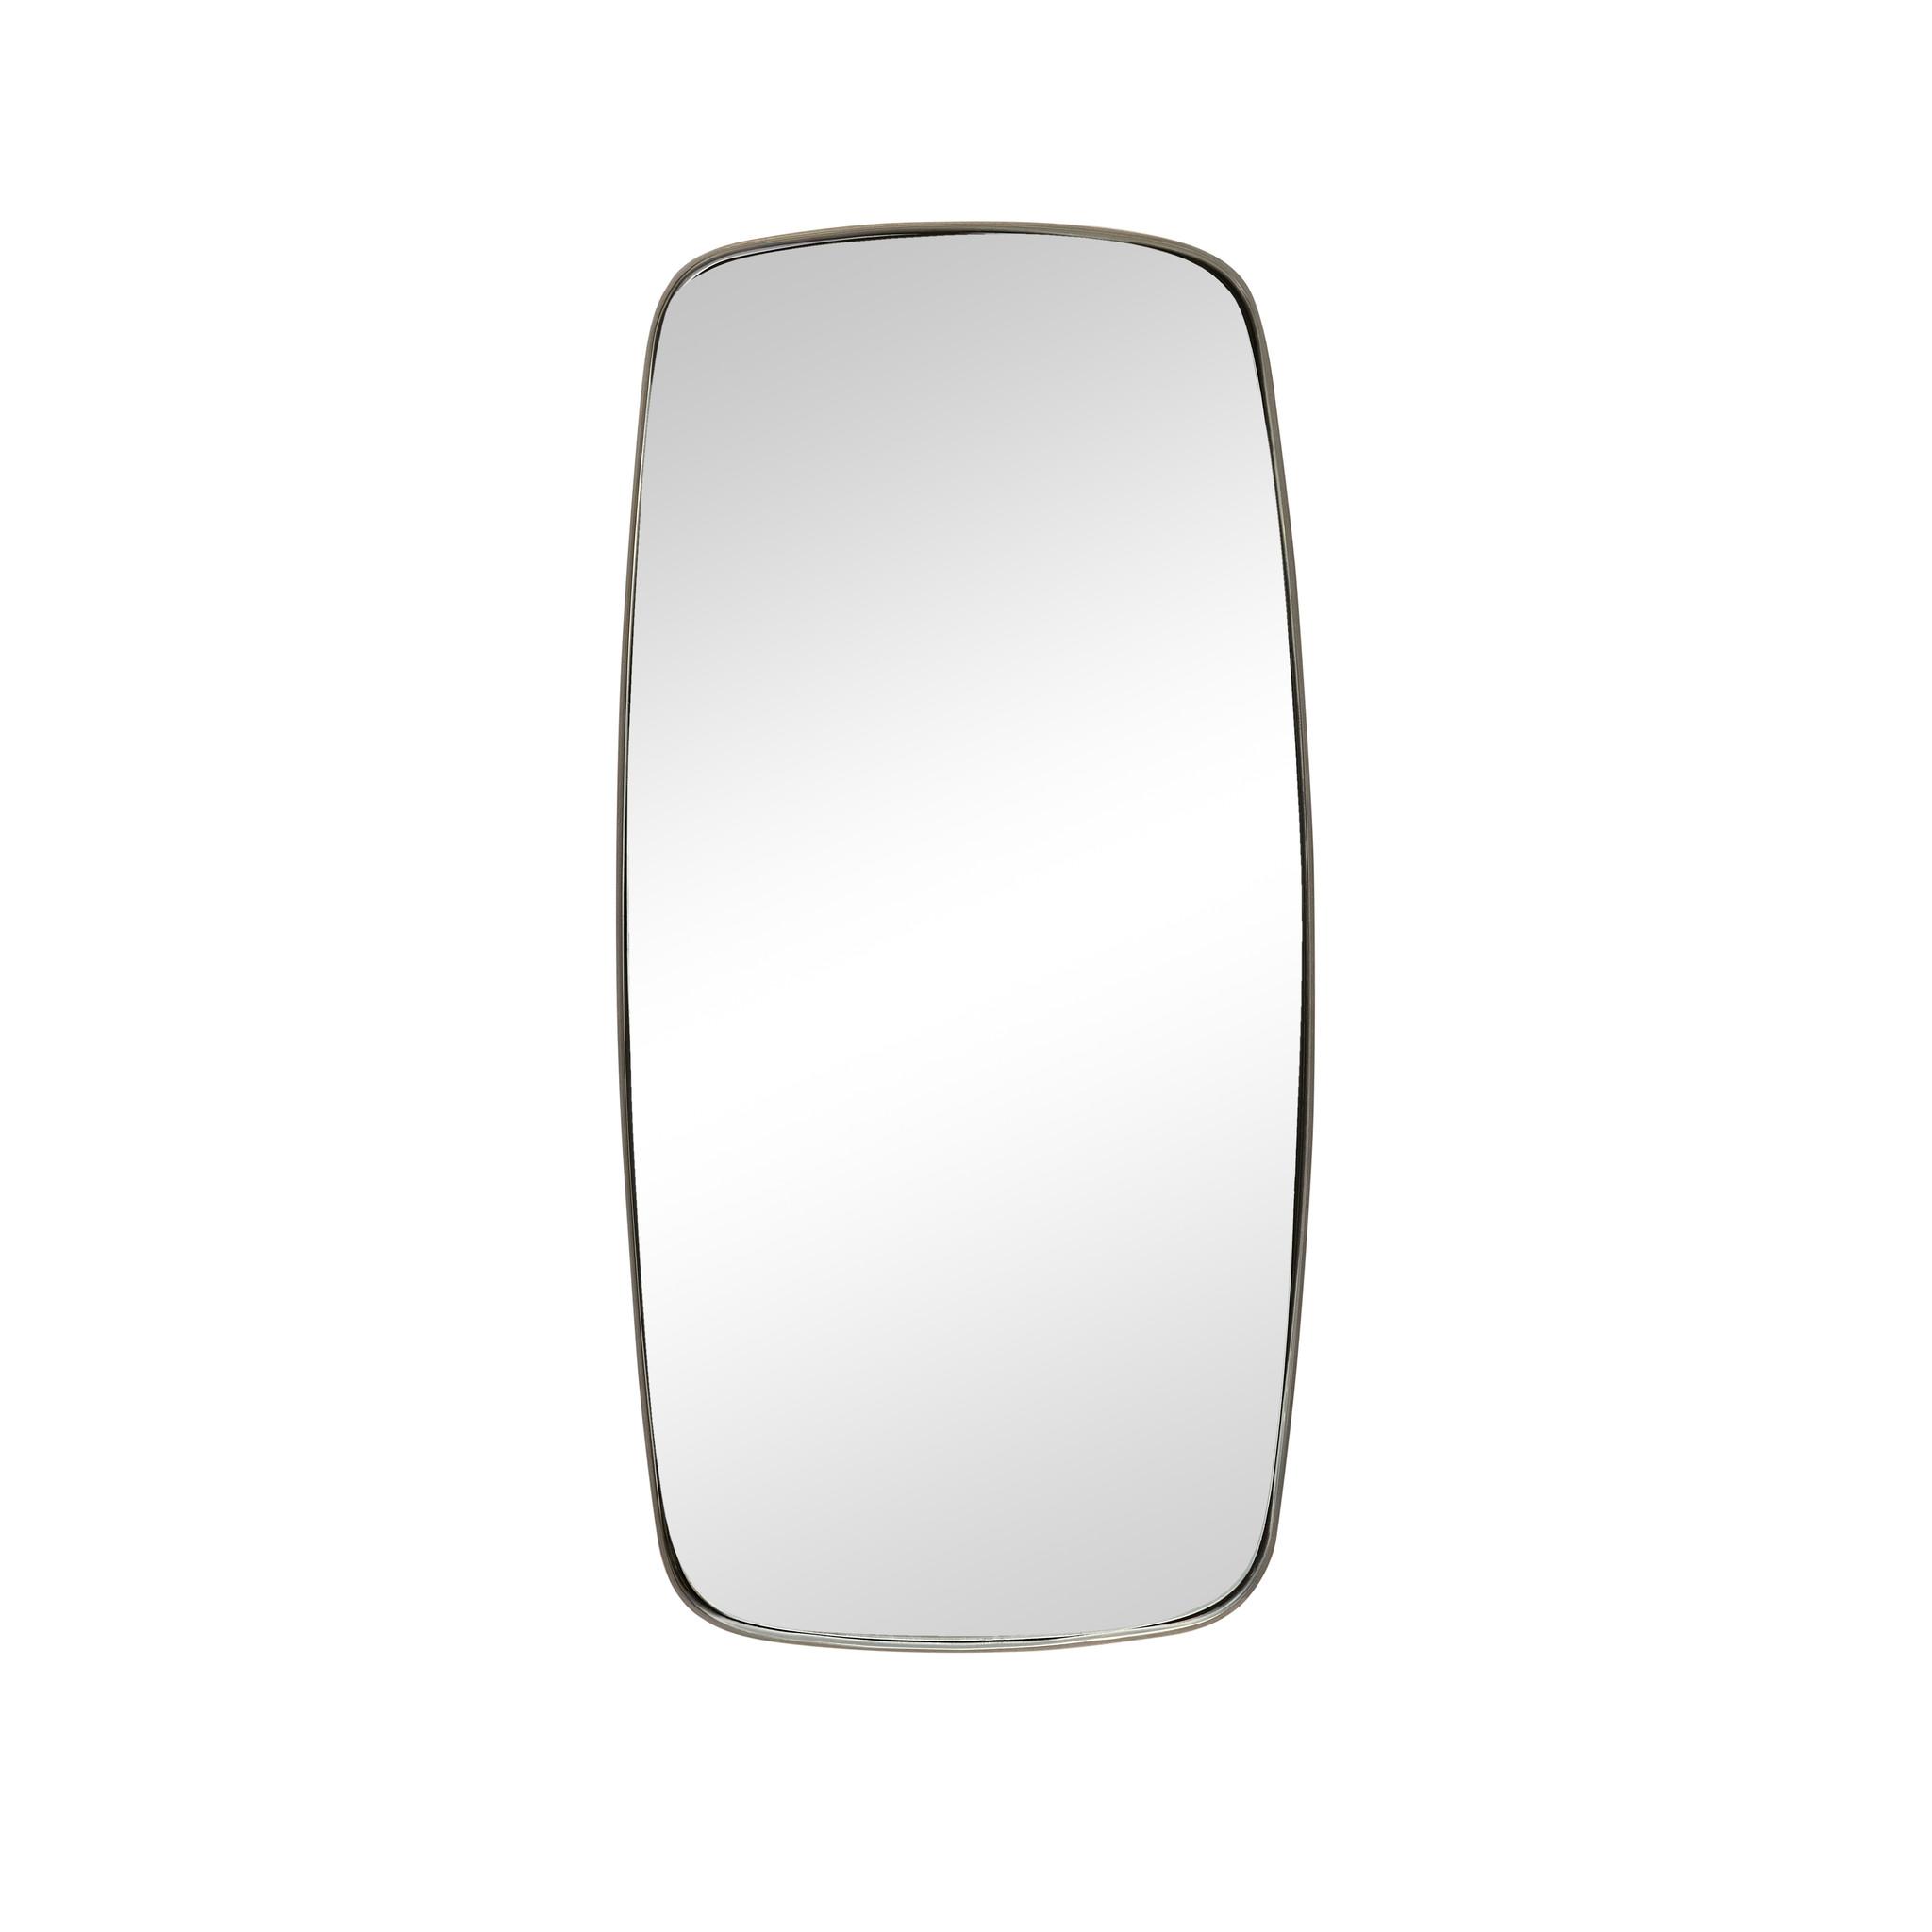 Hubsch Wandspiegel met metalen frame, vierkant-340504-5712772060940